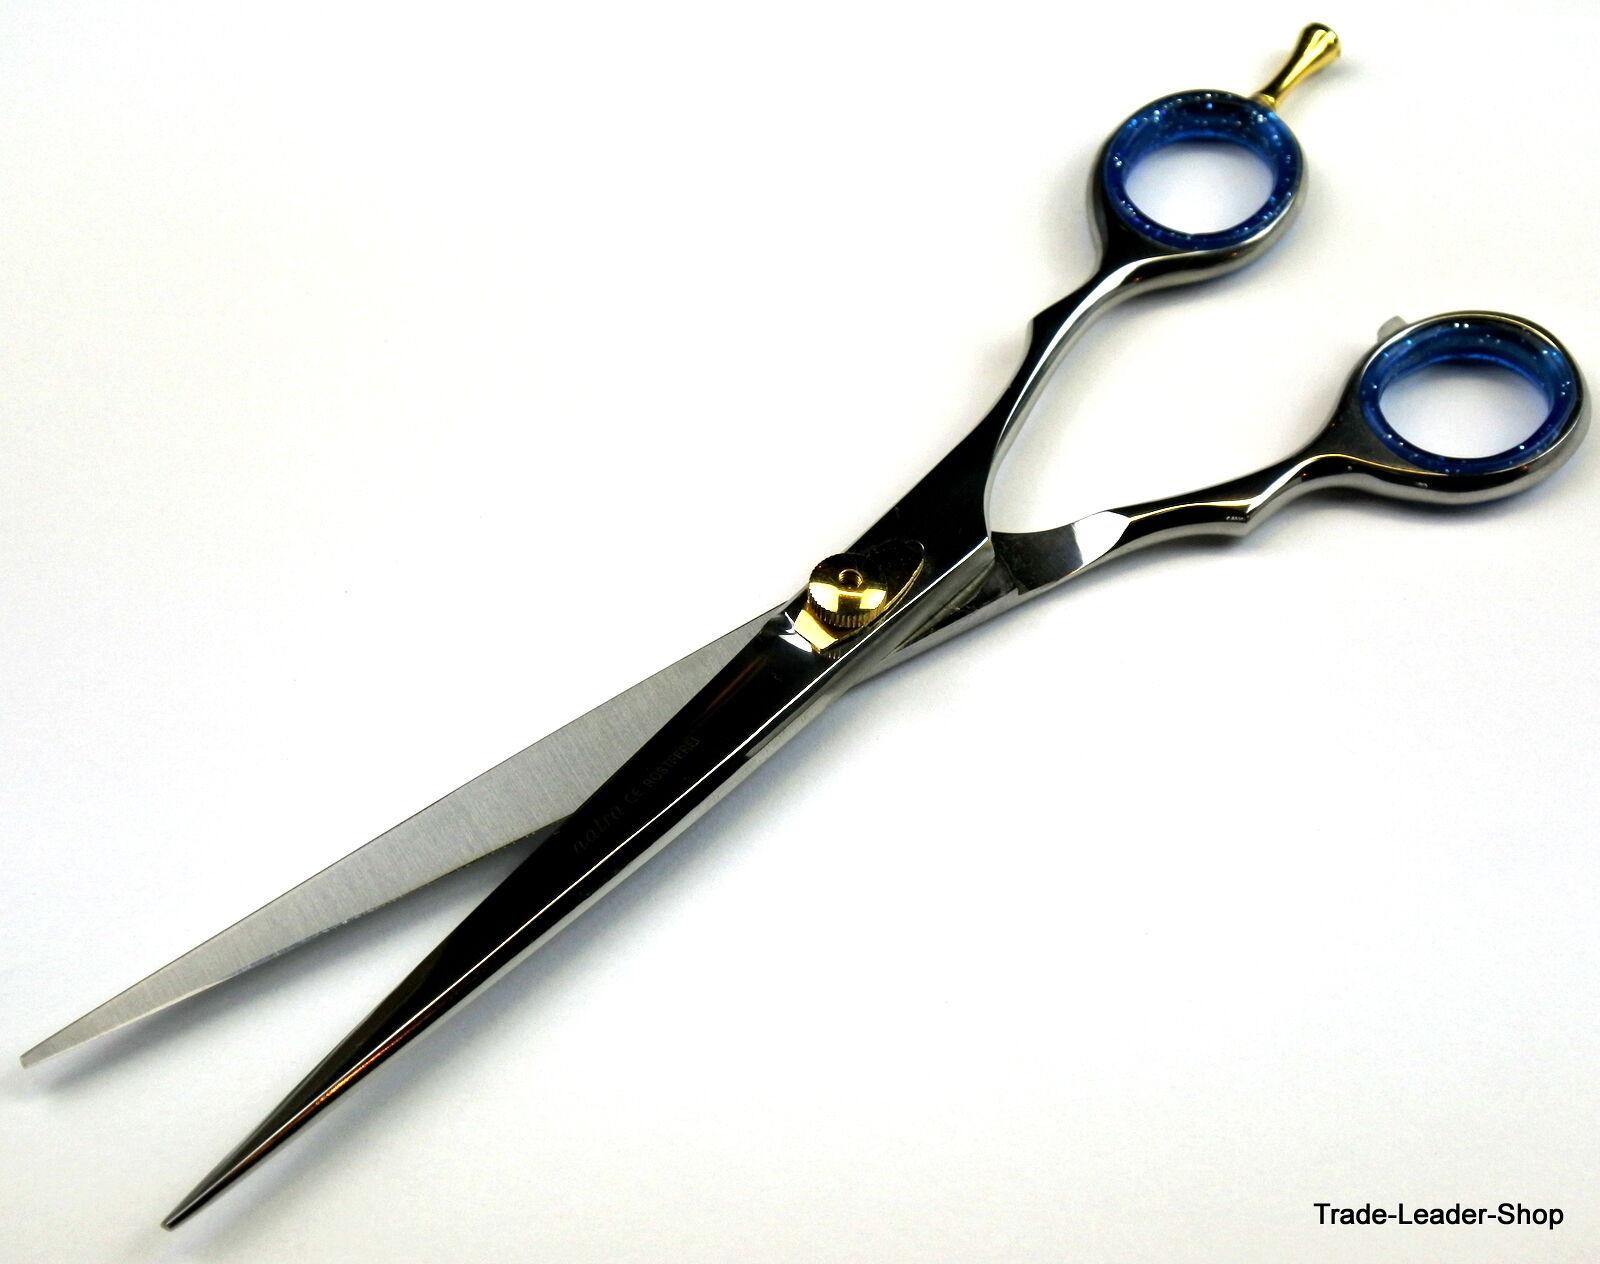 Hair Scissors Hairdressing Hairstyle Barber Salon Shears 20 Cm 8\